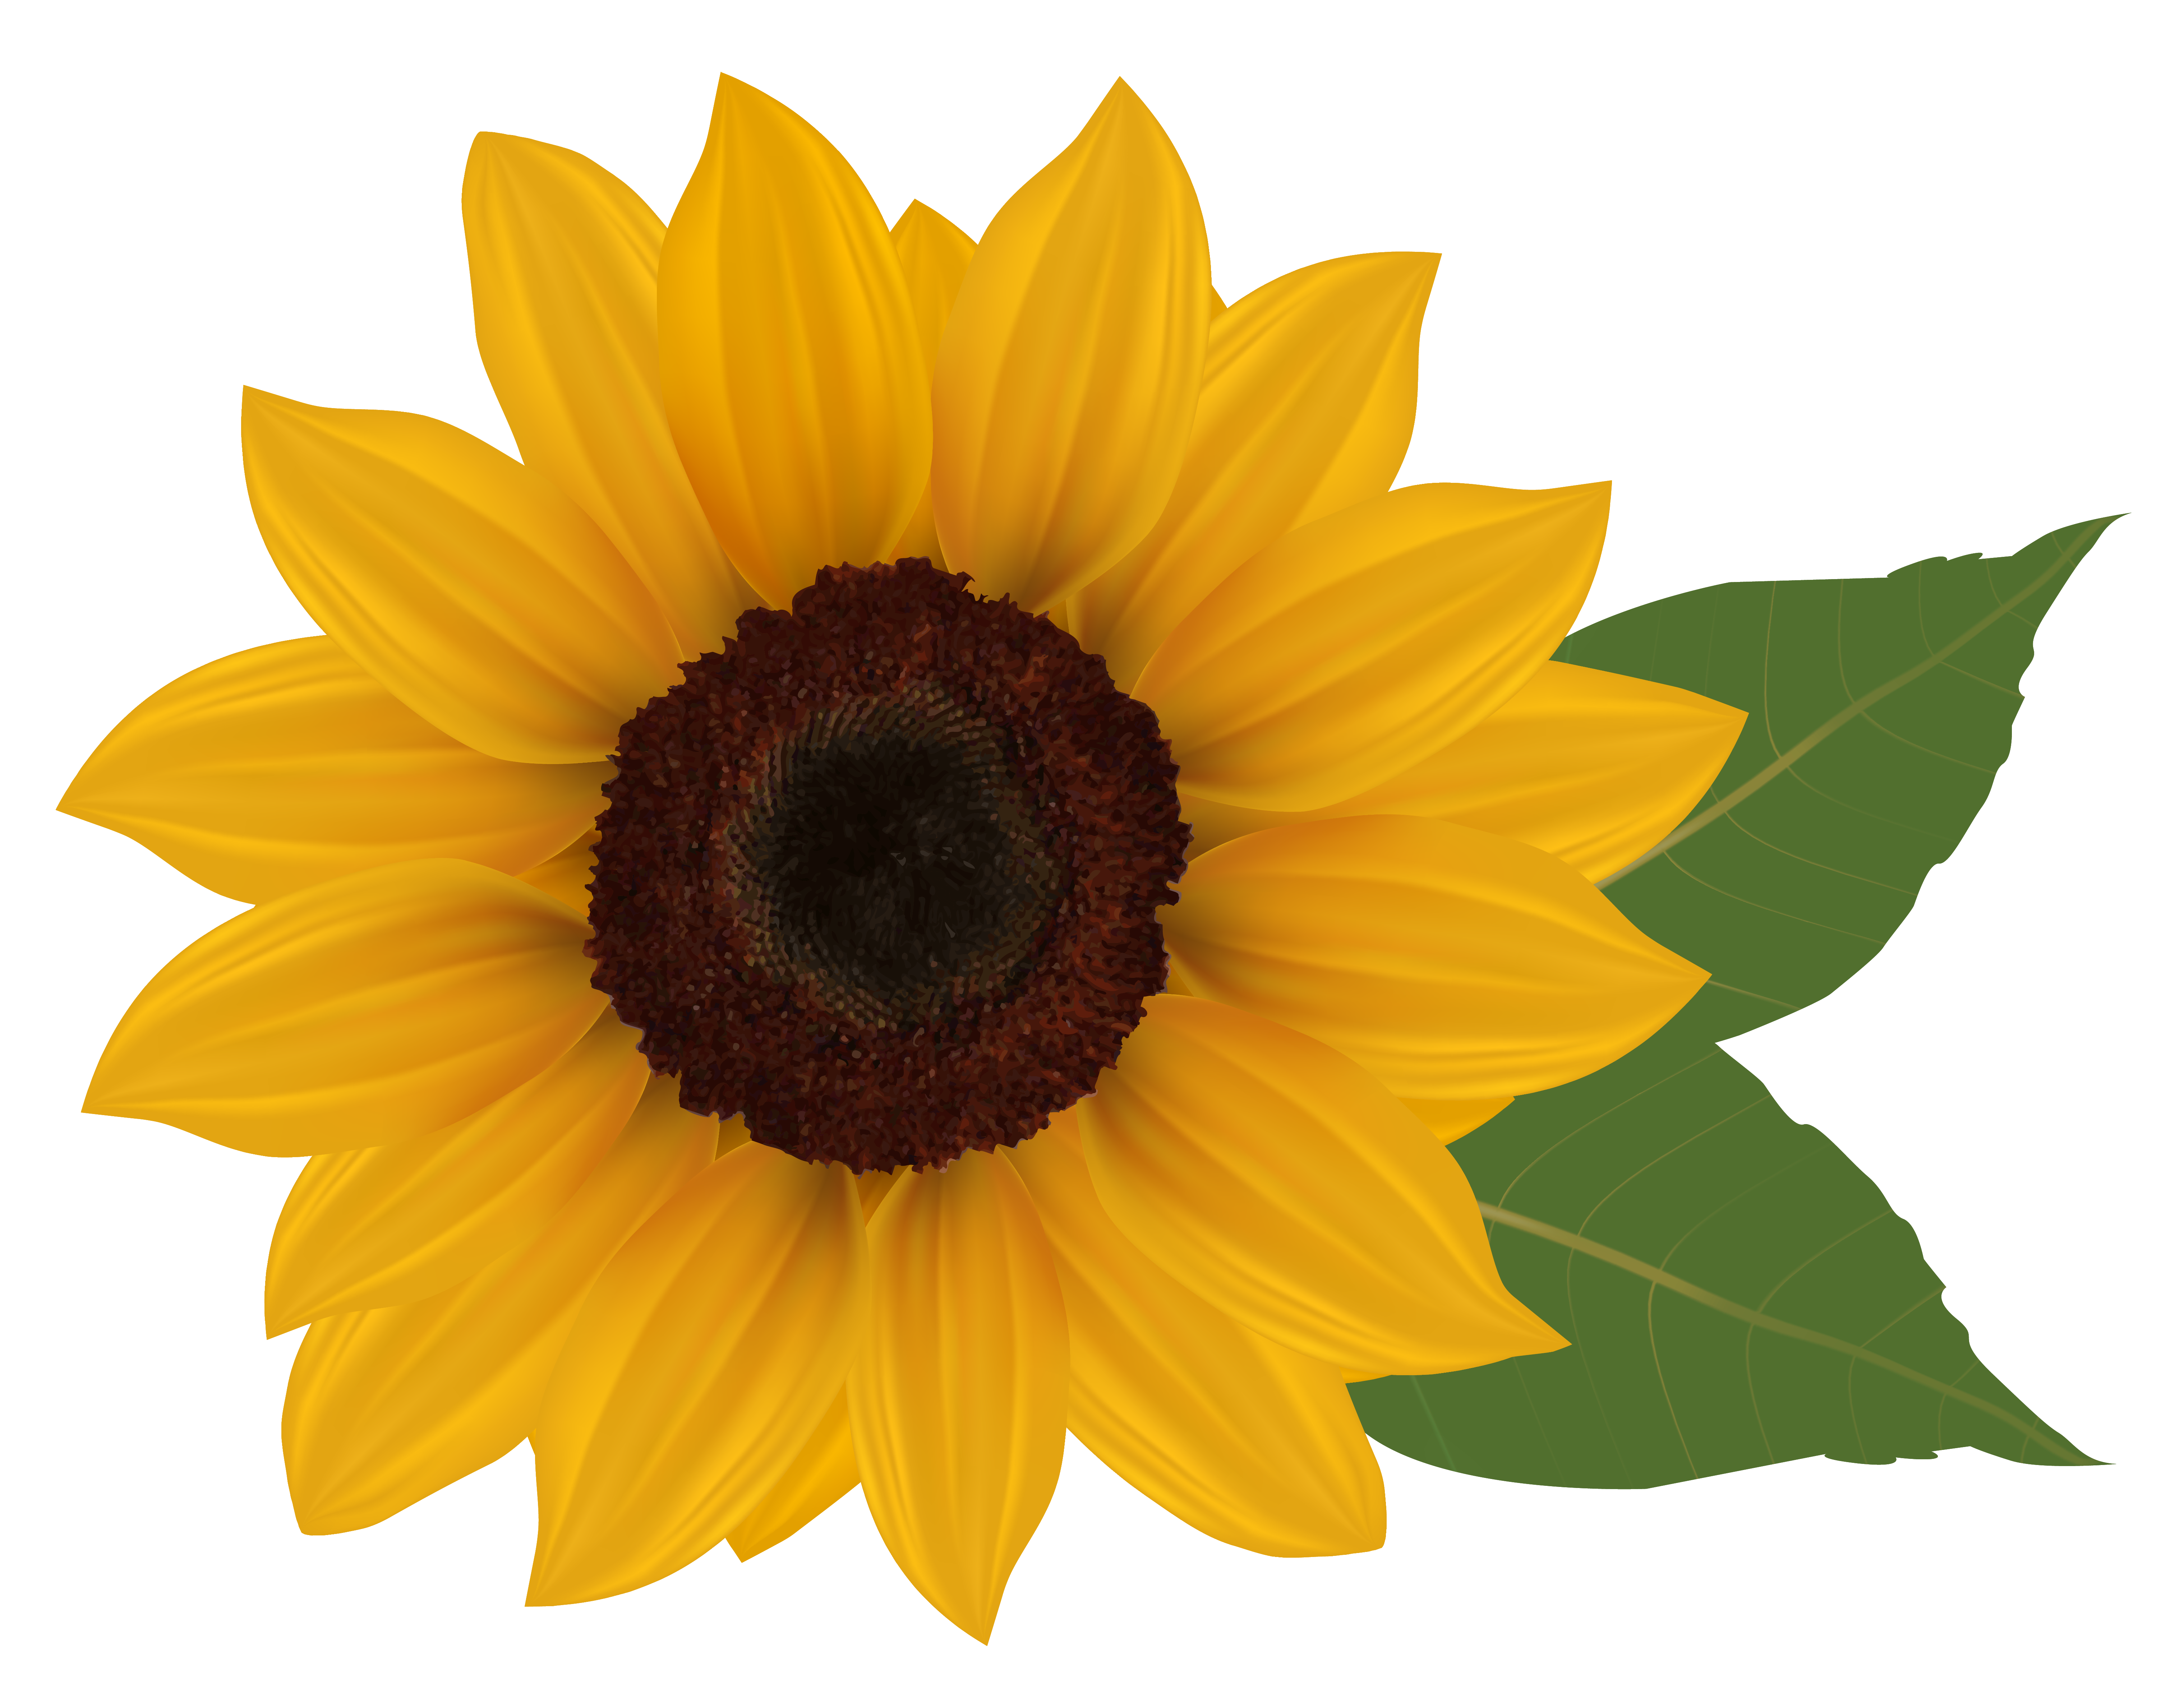 Sunflowers clip art.